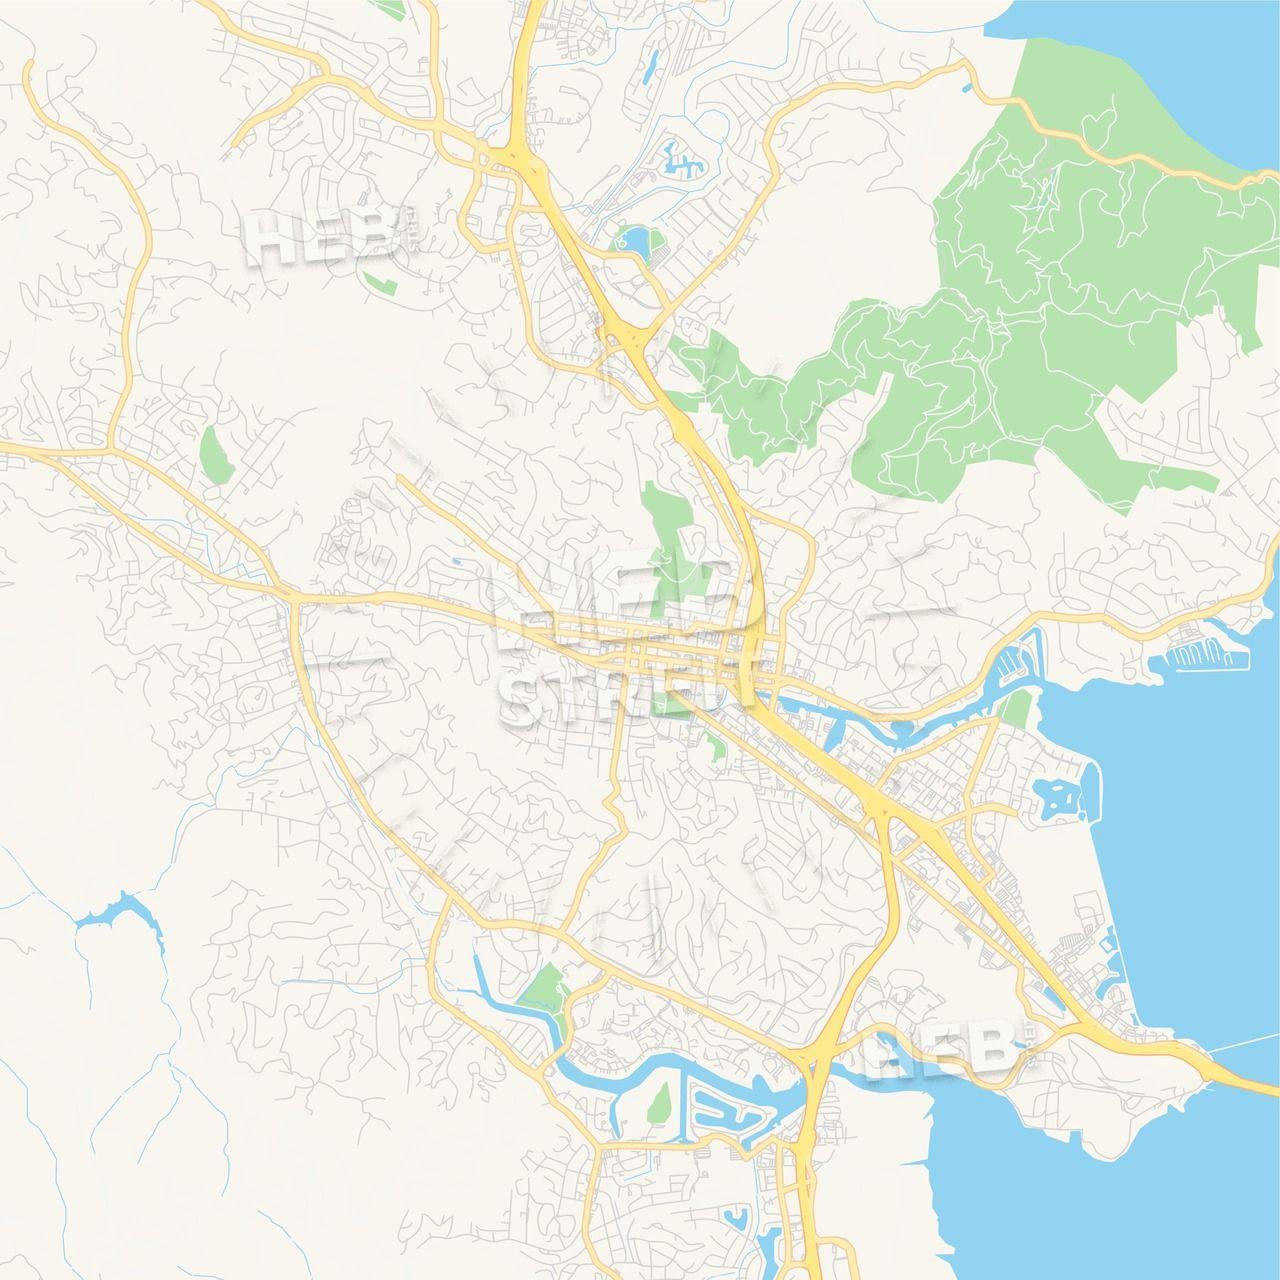 Empty vector map of San Rafael, California, USA | Maps ... on rockridge map, concord area map, marin ca map, los altos map, rancho blanco map, san pablo map, el rincon map, los robles map, downieville map, marin county civic center map, felton map, point richmond map, sandia park map, san lorenzo map, rancho san antonio park map, yerba buena map, city of san francisco map, bay area map, south san francisco map, palisades trail map,